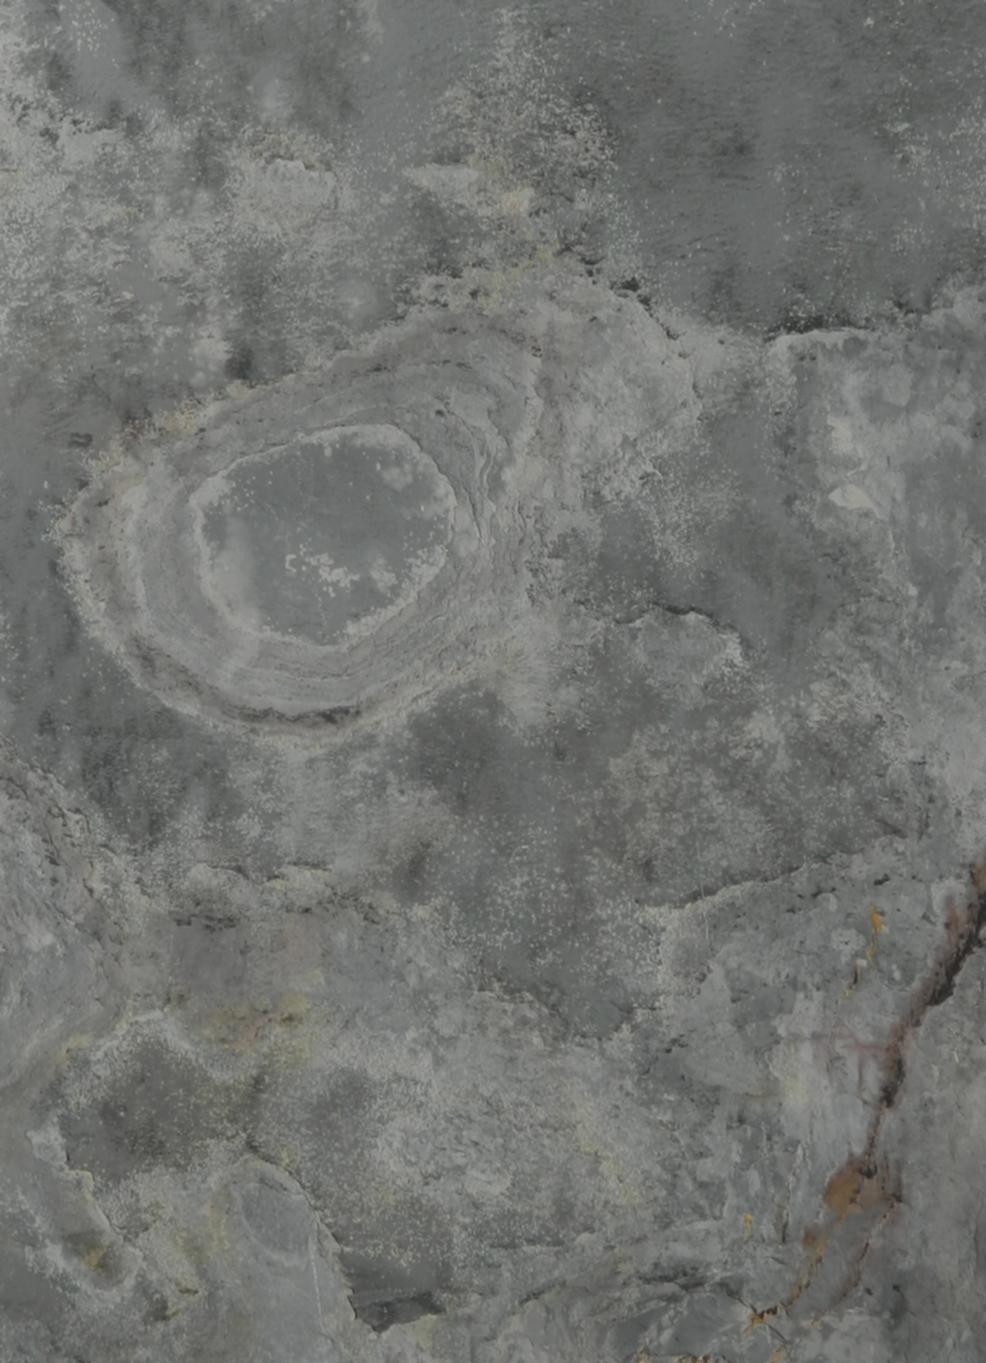 9007 Earth Crust